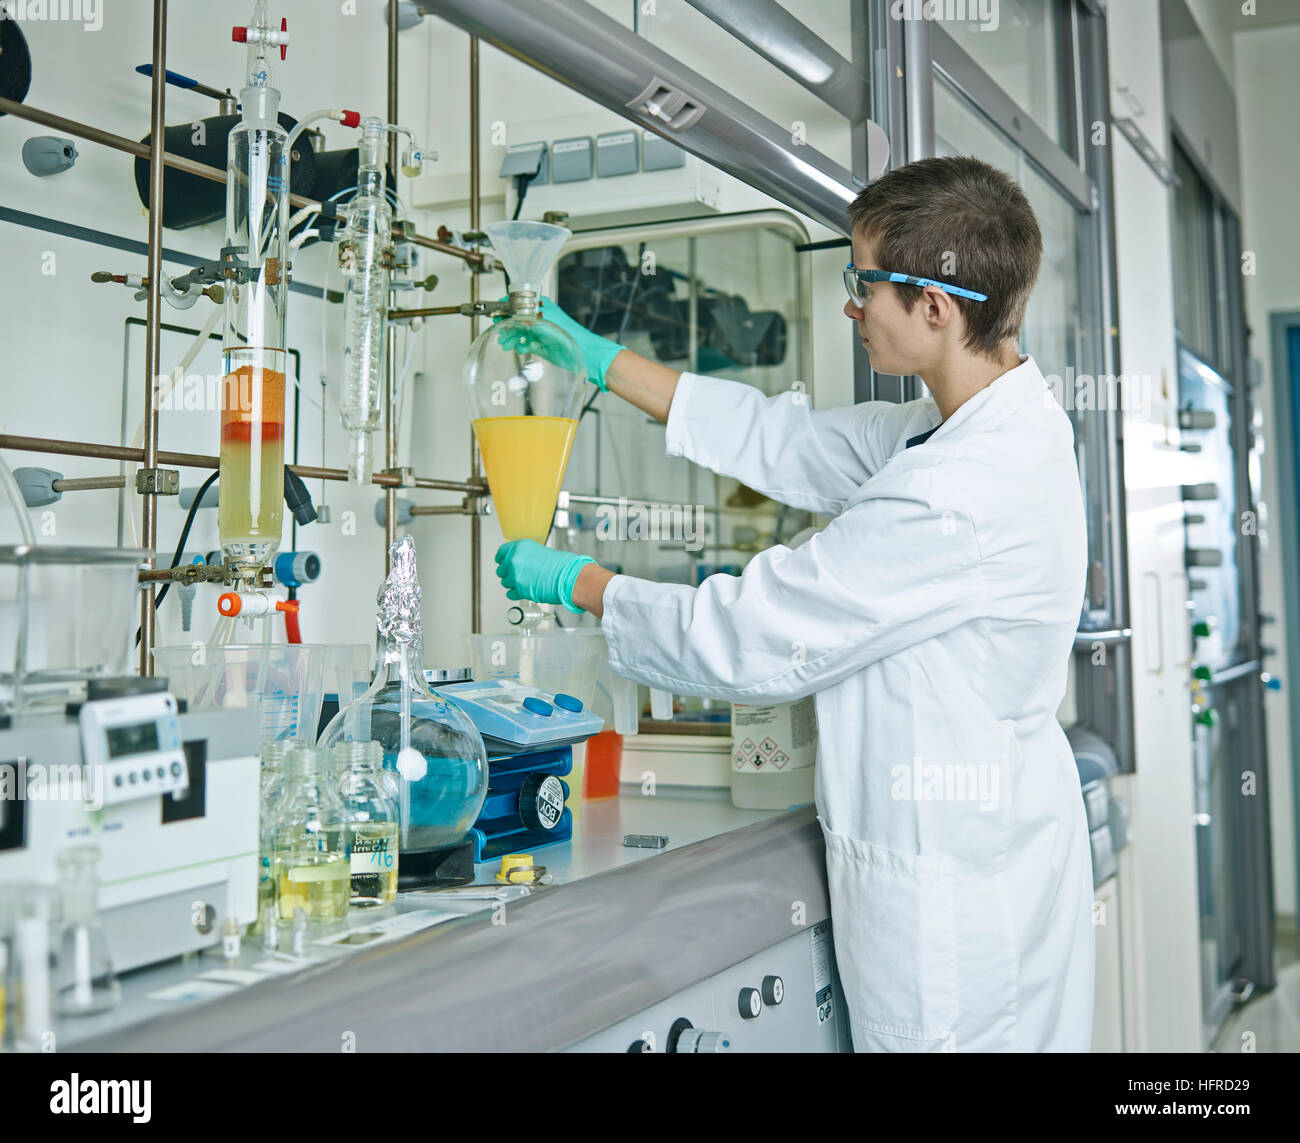 Laboratory chemist in a laboratory, Tyrol, Austria - Stock Image